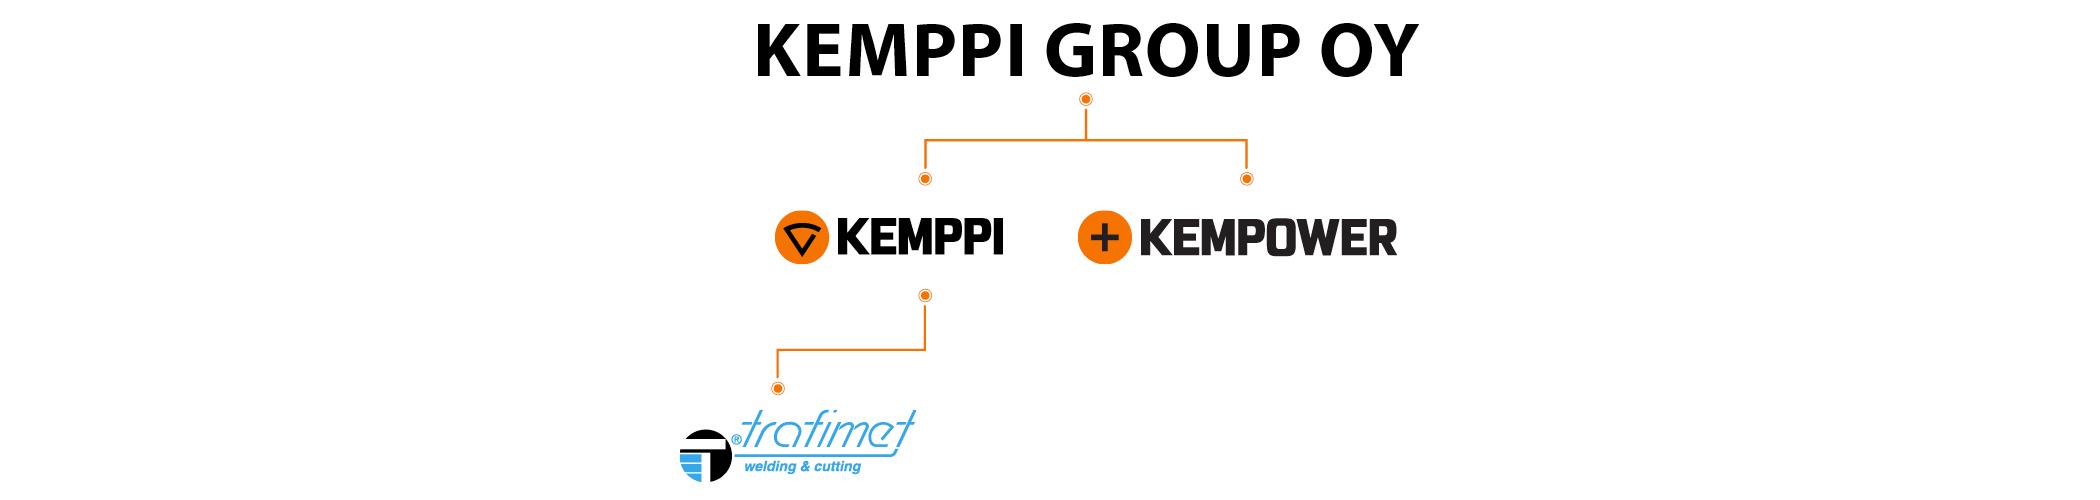 Kemppi Group